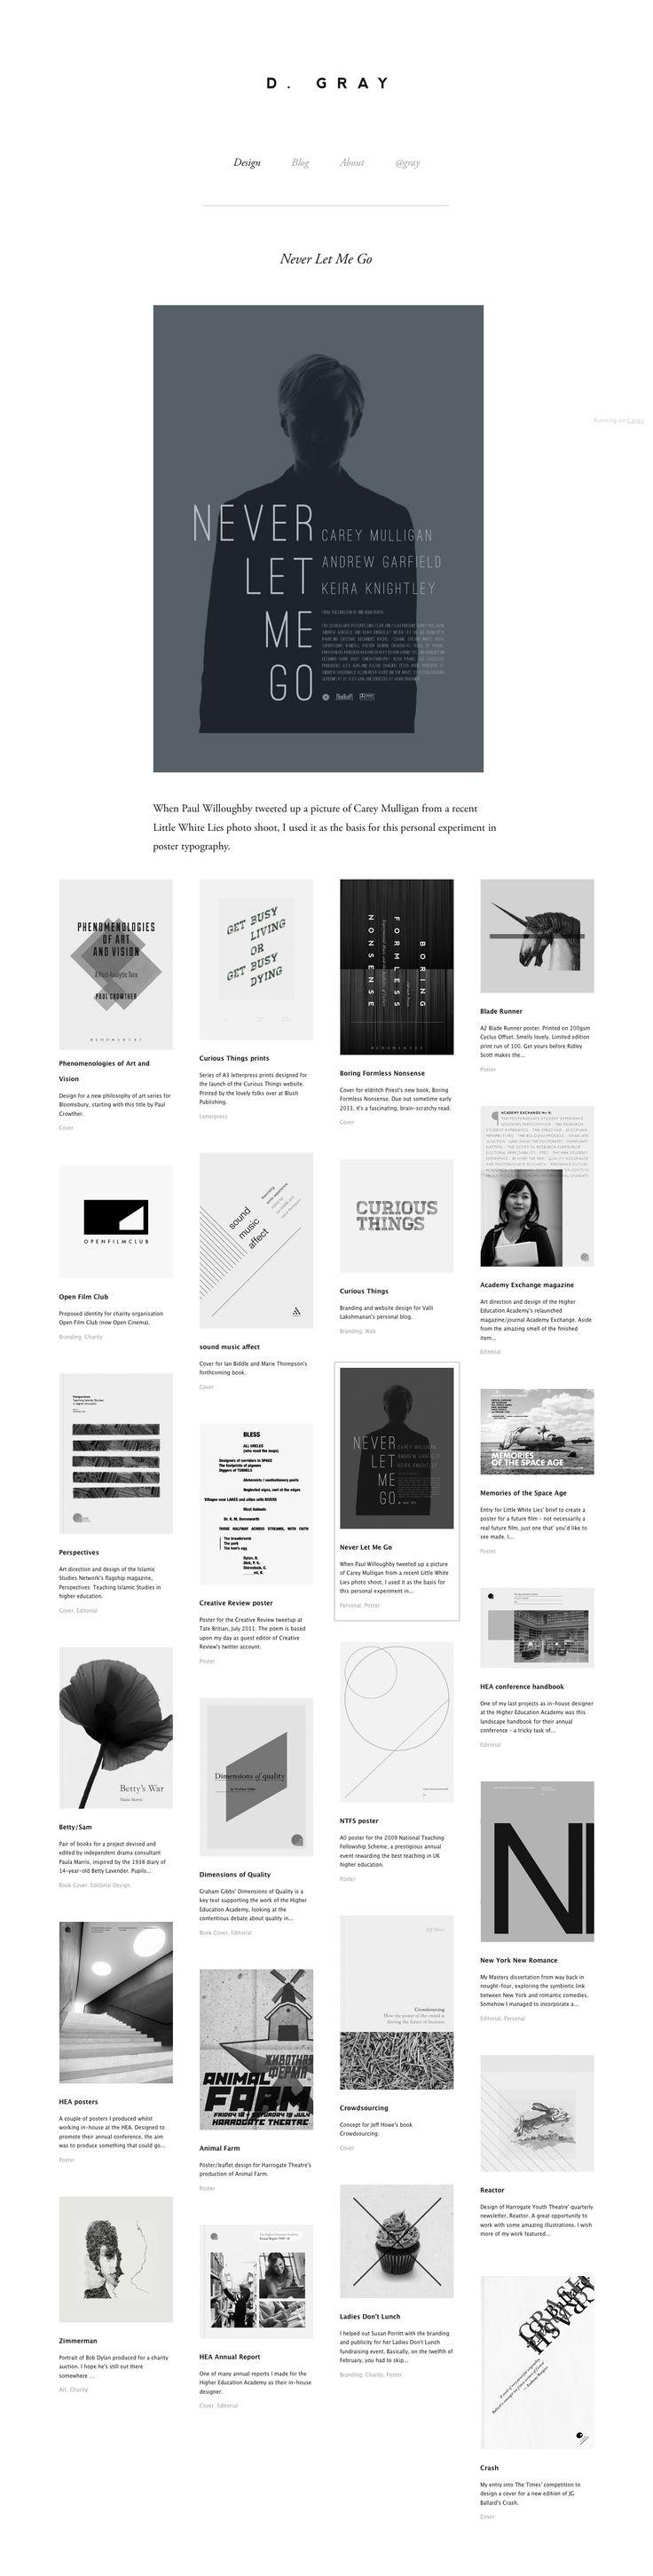 Gimme Bar : Public Firehose #WebDesign #Web #Design #UI #UX #GUI #FullScreen #Responsive #ResponsiveDesign #Brand #webSite #Creative